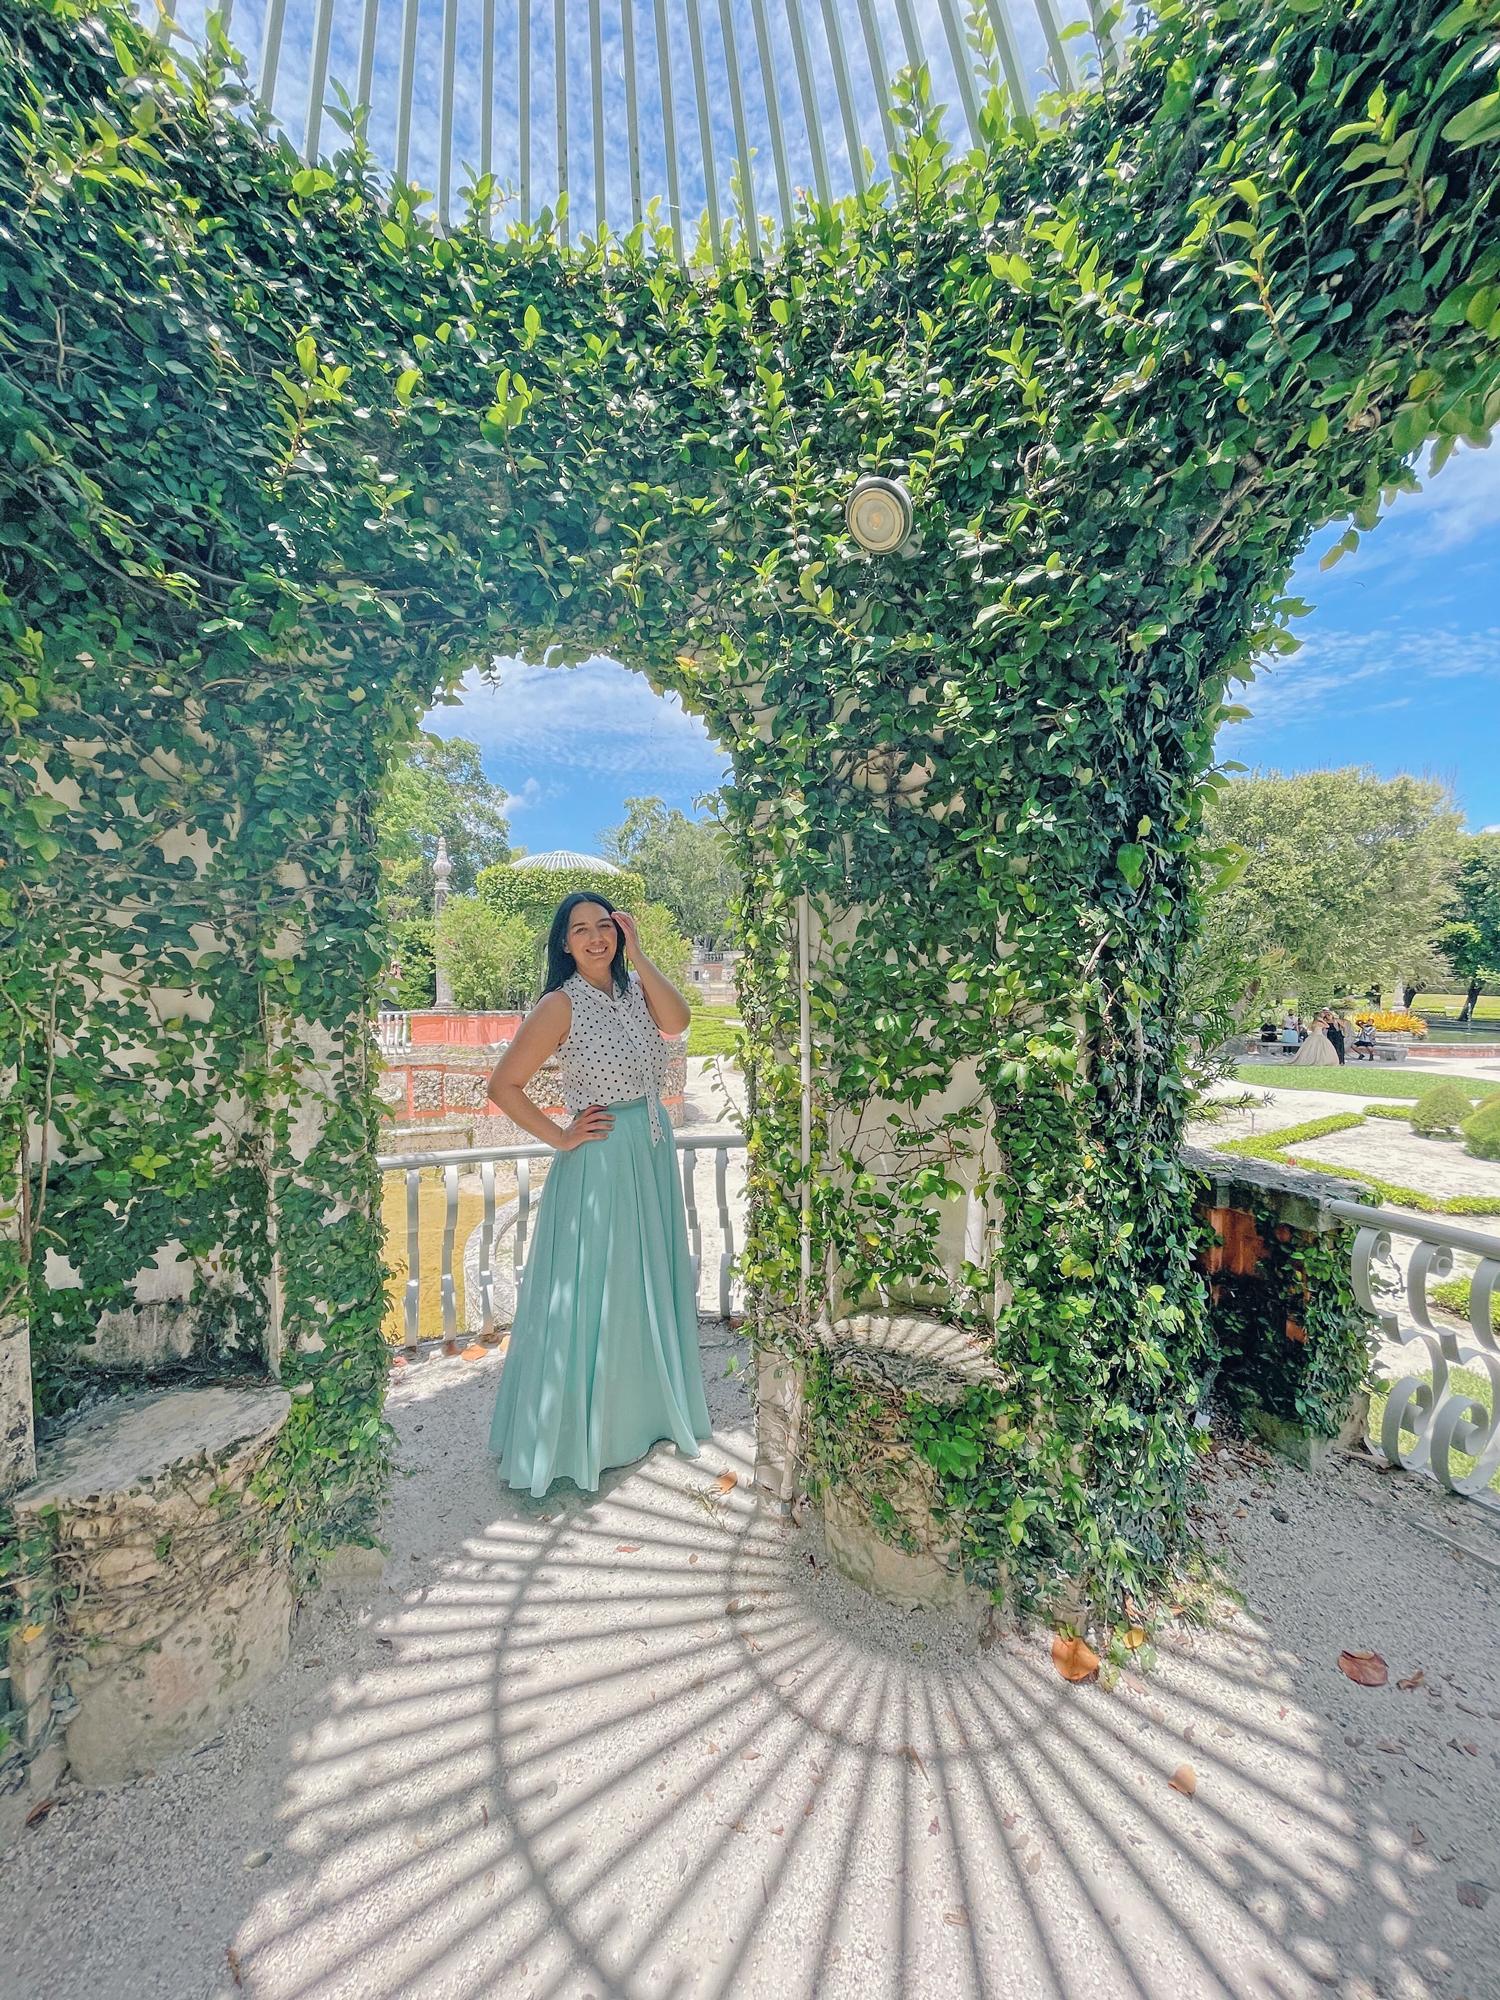 Best Things To Do in Miami: Vizacaya Museum & Gardens romantic photoshoot